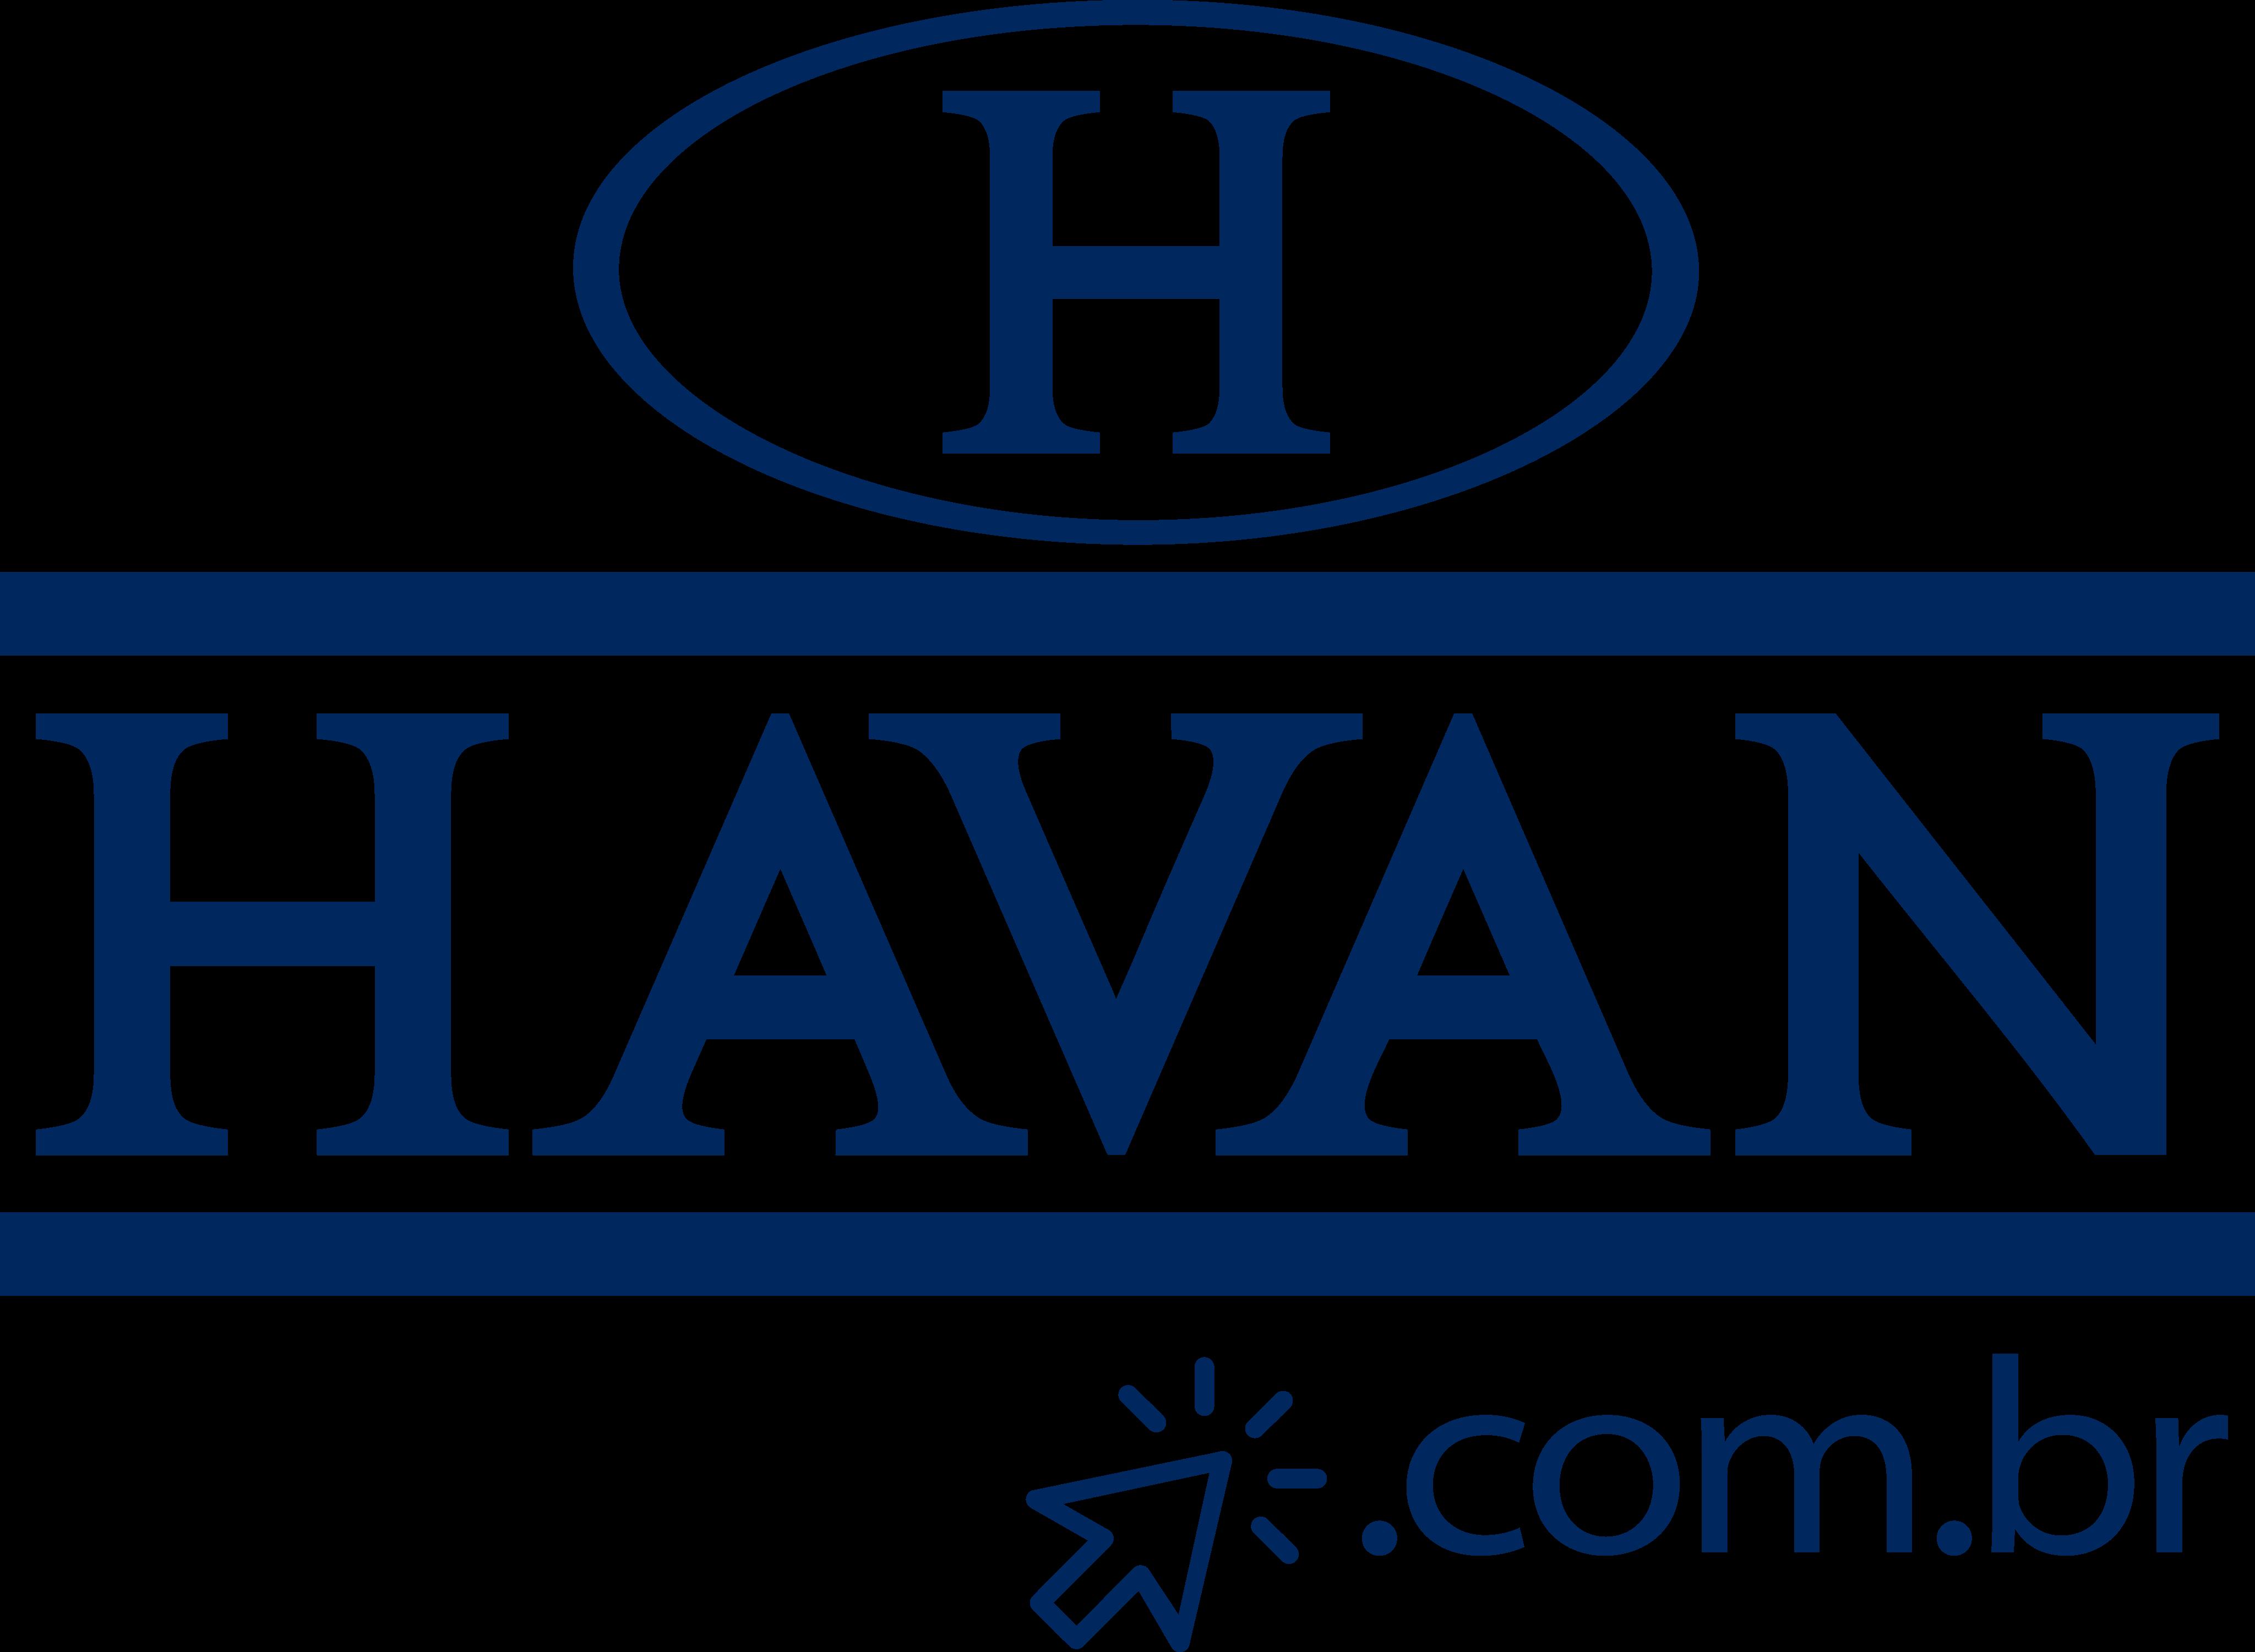 havan logo 1 - Havan Logo